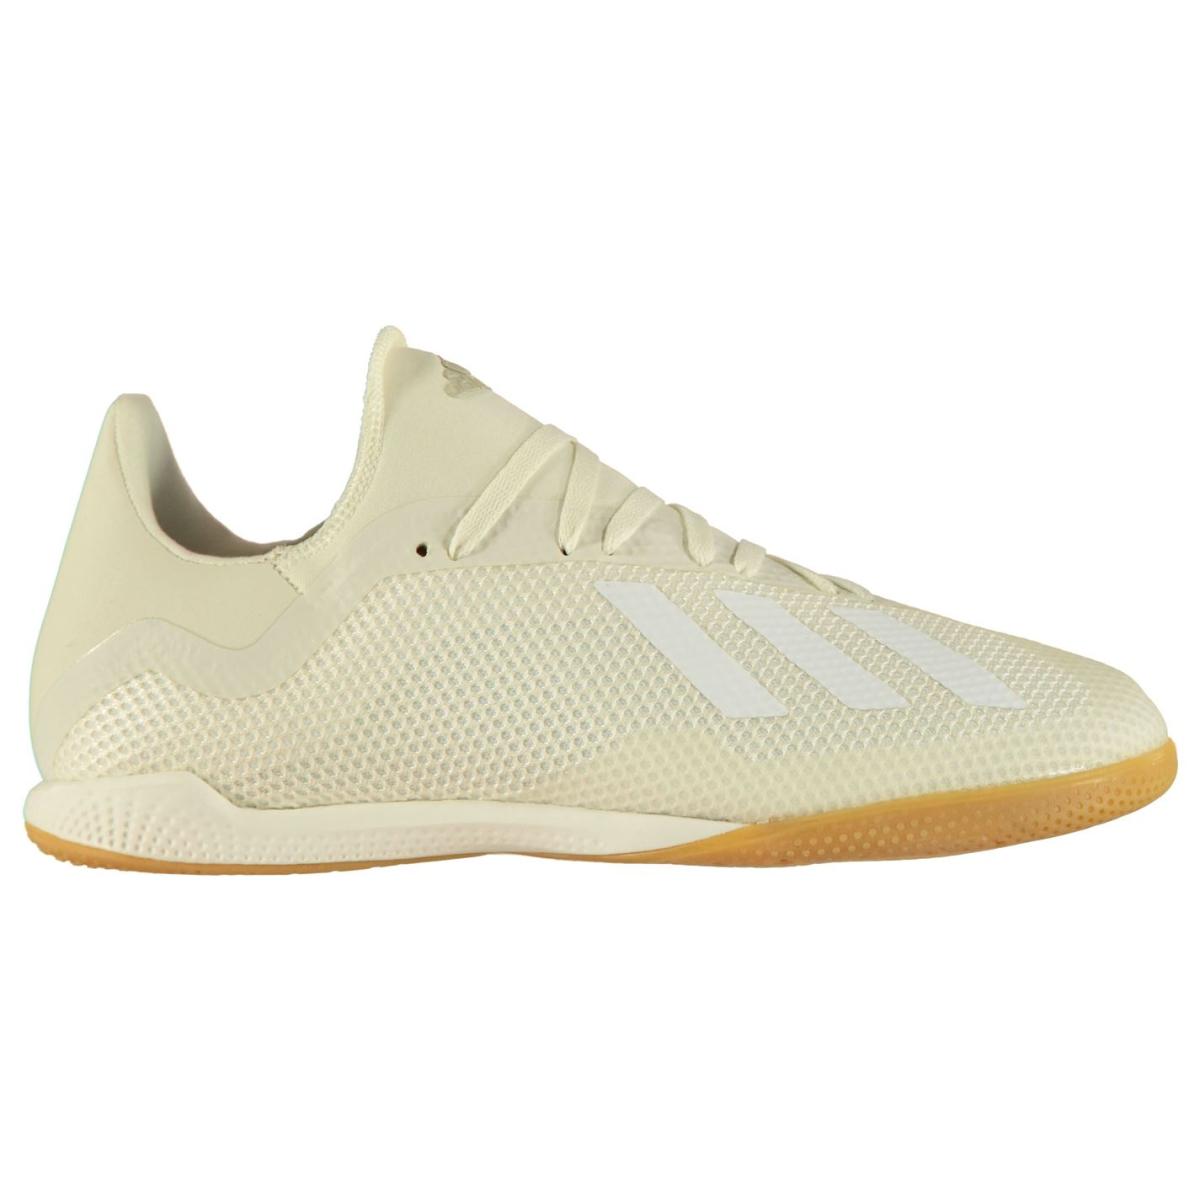 adidas X Tango 18.3 Herren Indoor Fußballschuhe OffWeiß